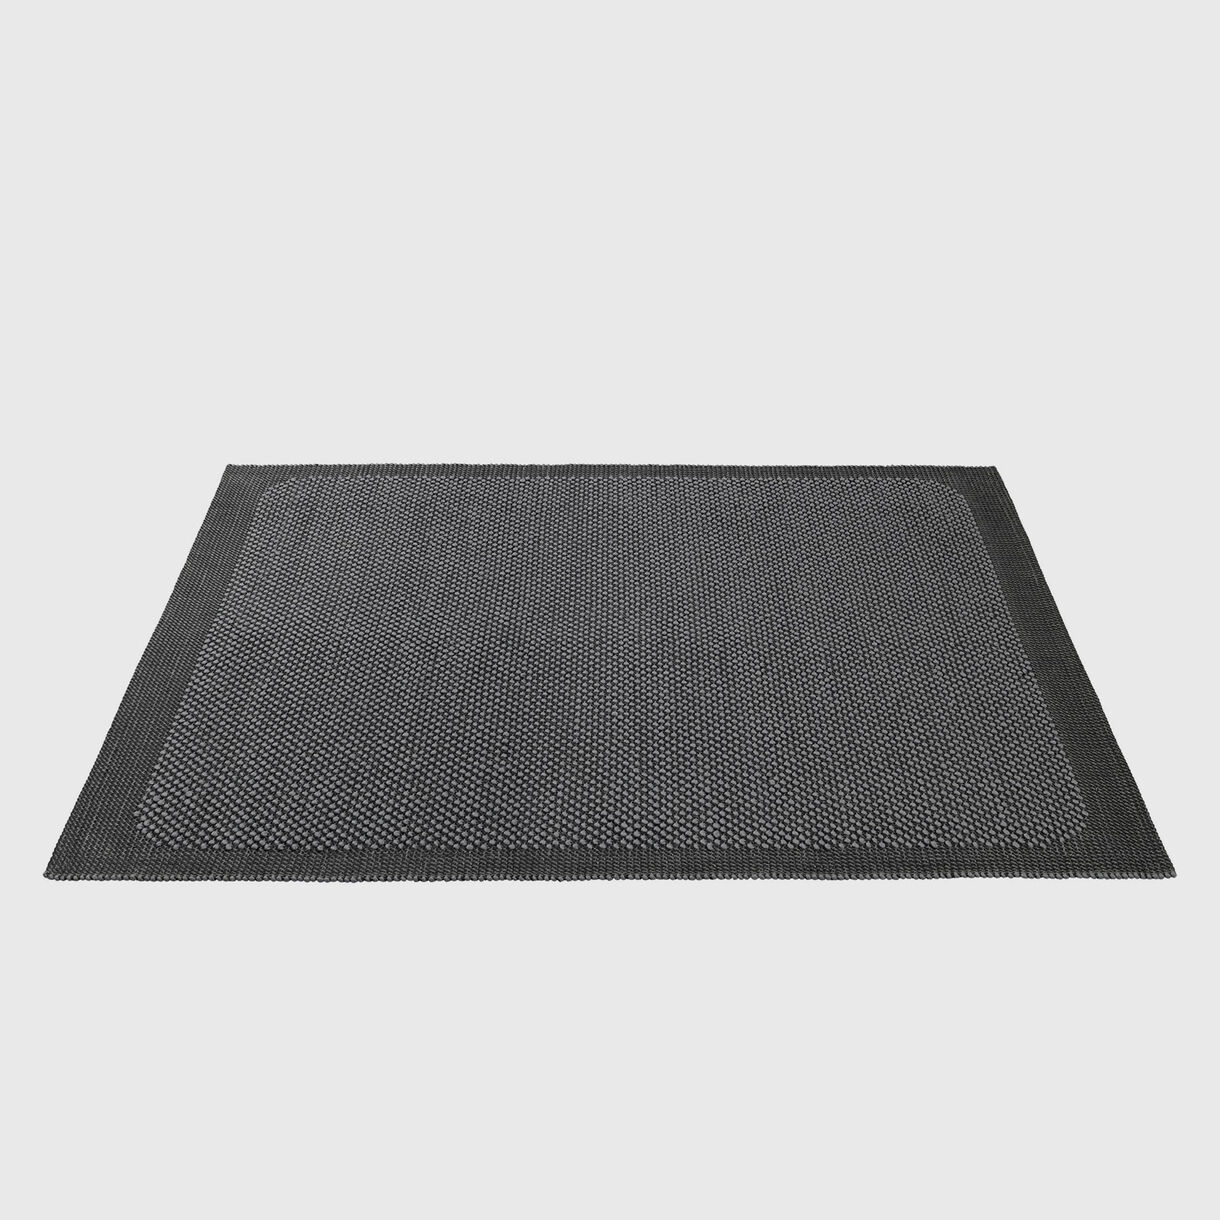 Pebble Rug, 2000 x 3000, Dark Grey